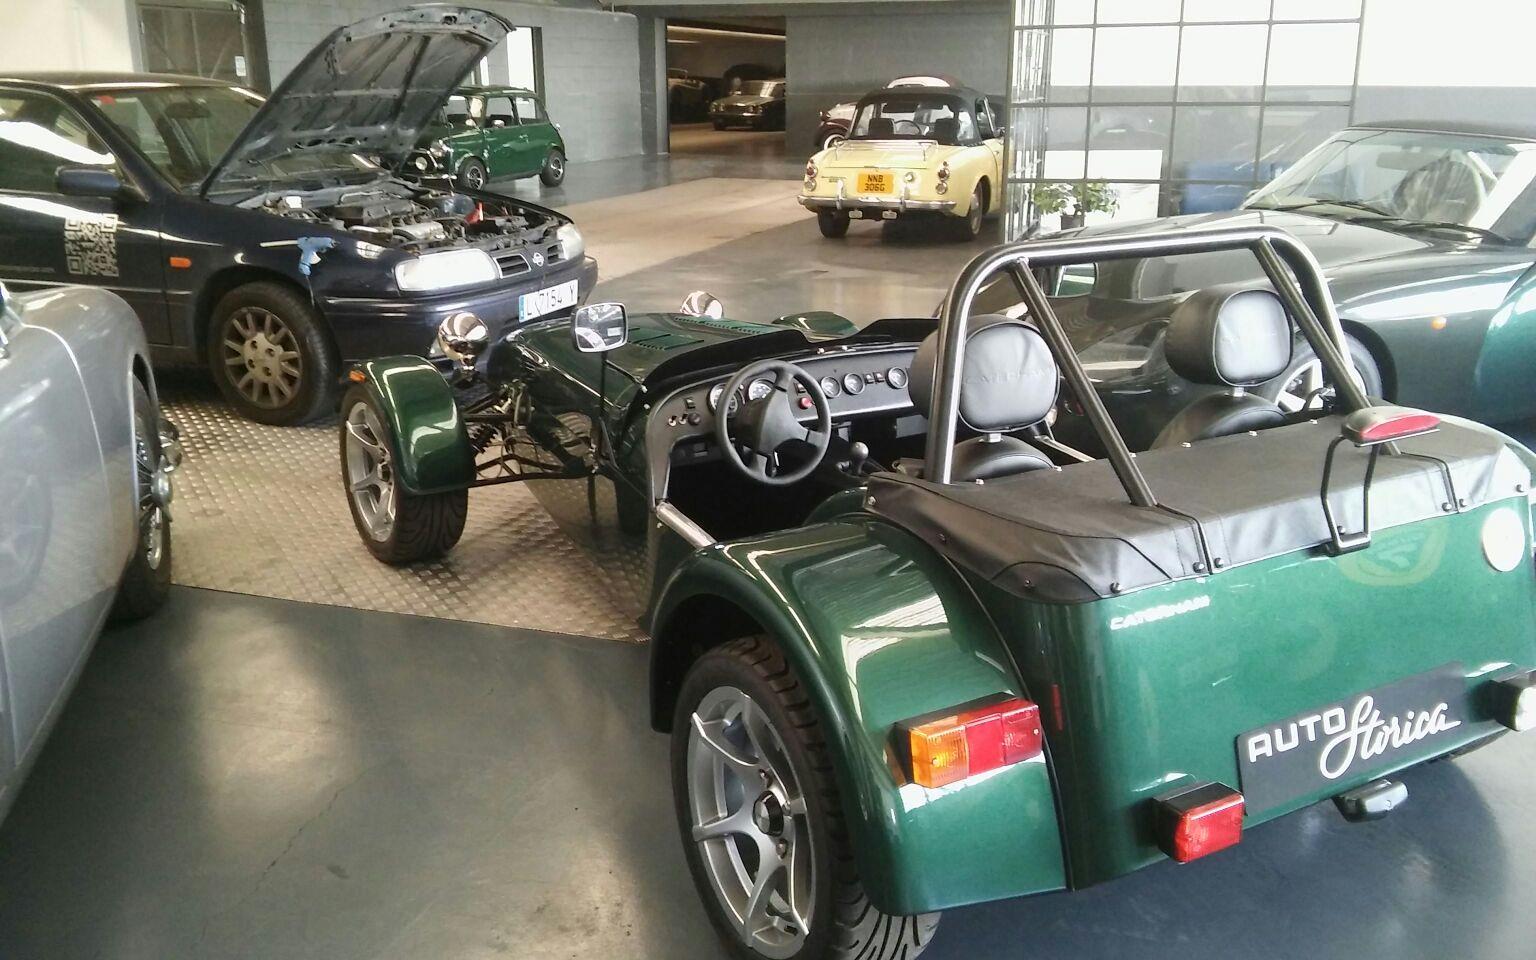 Reparando coches clásicos Autostorica